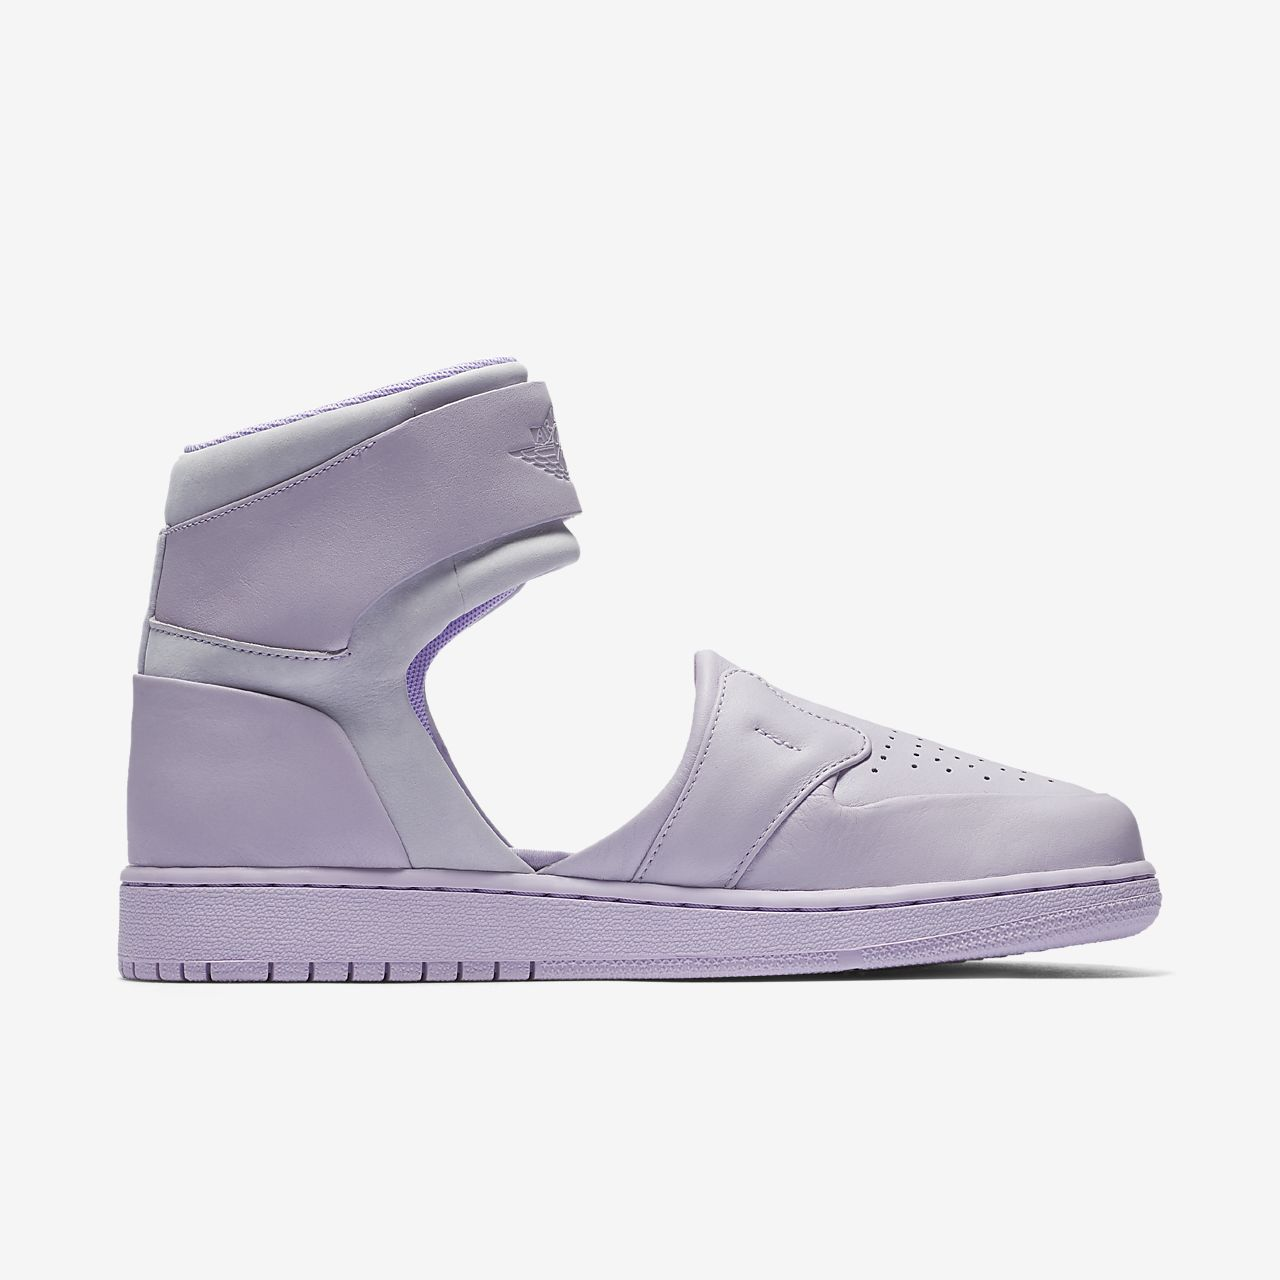 3737e8515f0f Jordan AJ1 Lover XX Women s Shoe. Nike.com GB